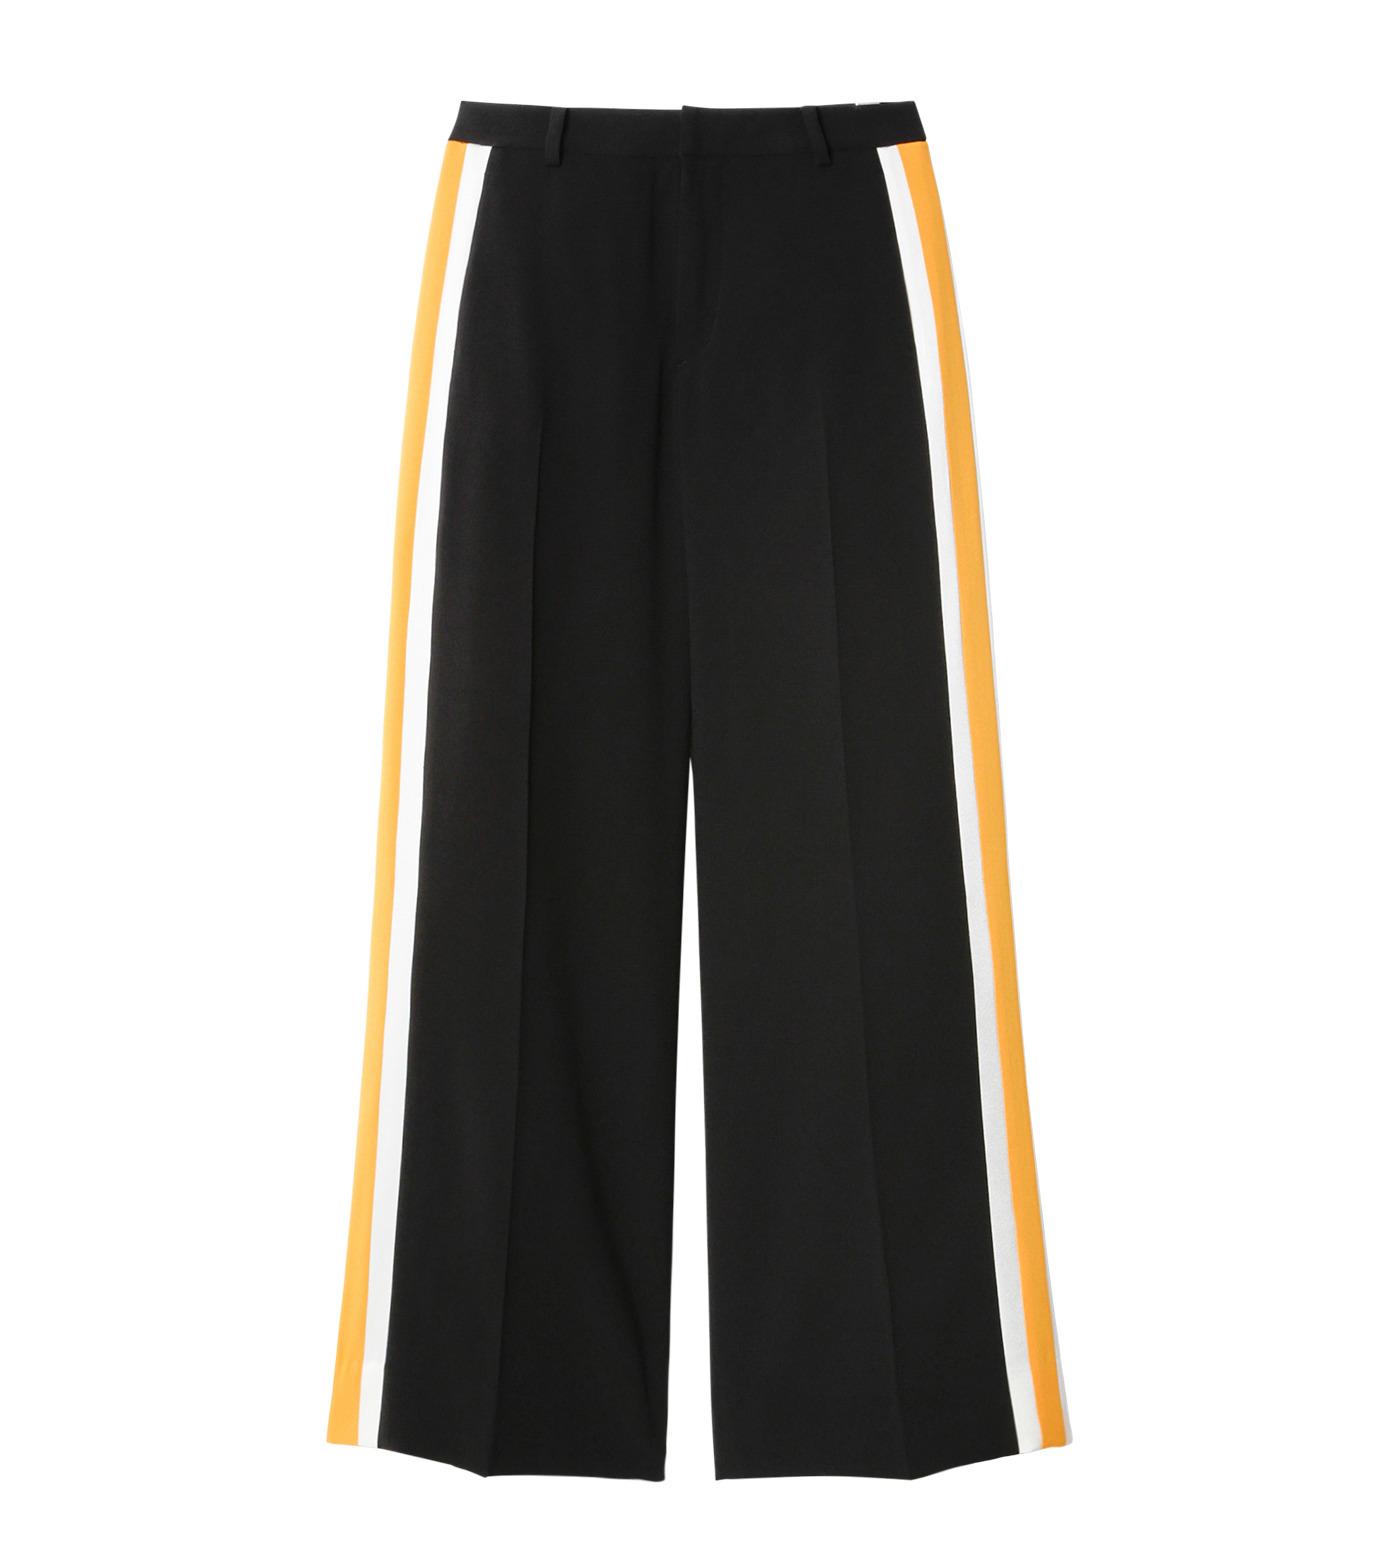 LE CIEL BLEU(ルシェルブルー)のトラックワイドパンツ-BLACK(パンツ/pants)-19S68103 拡大詳細画像1